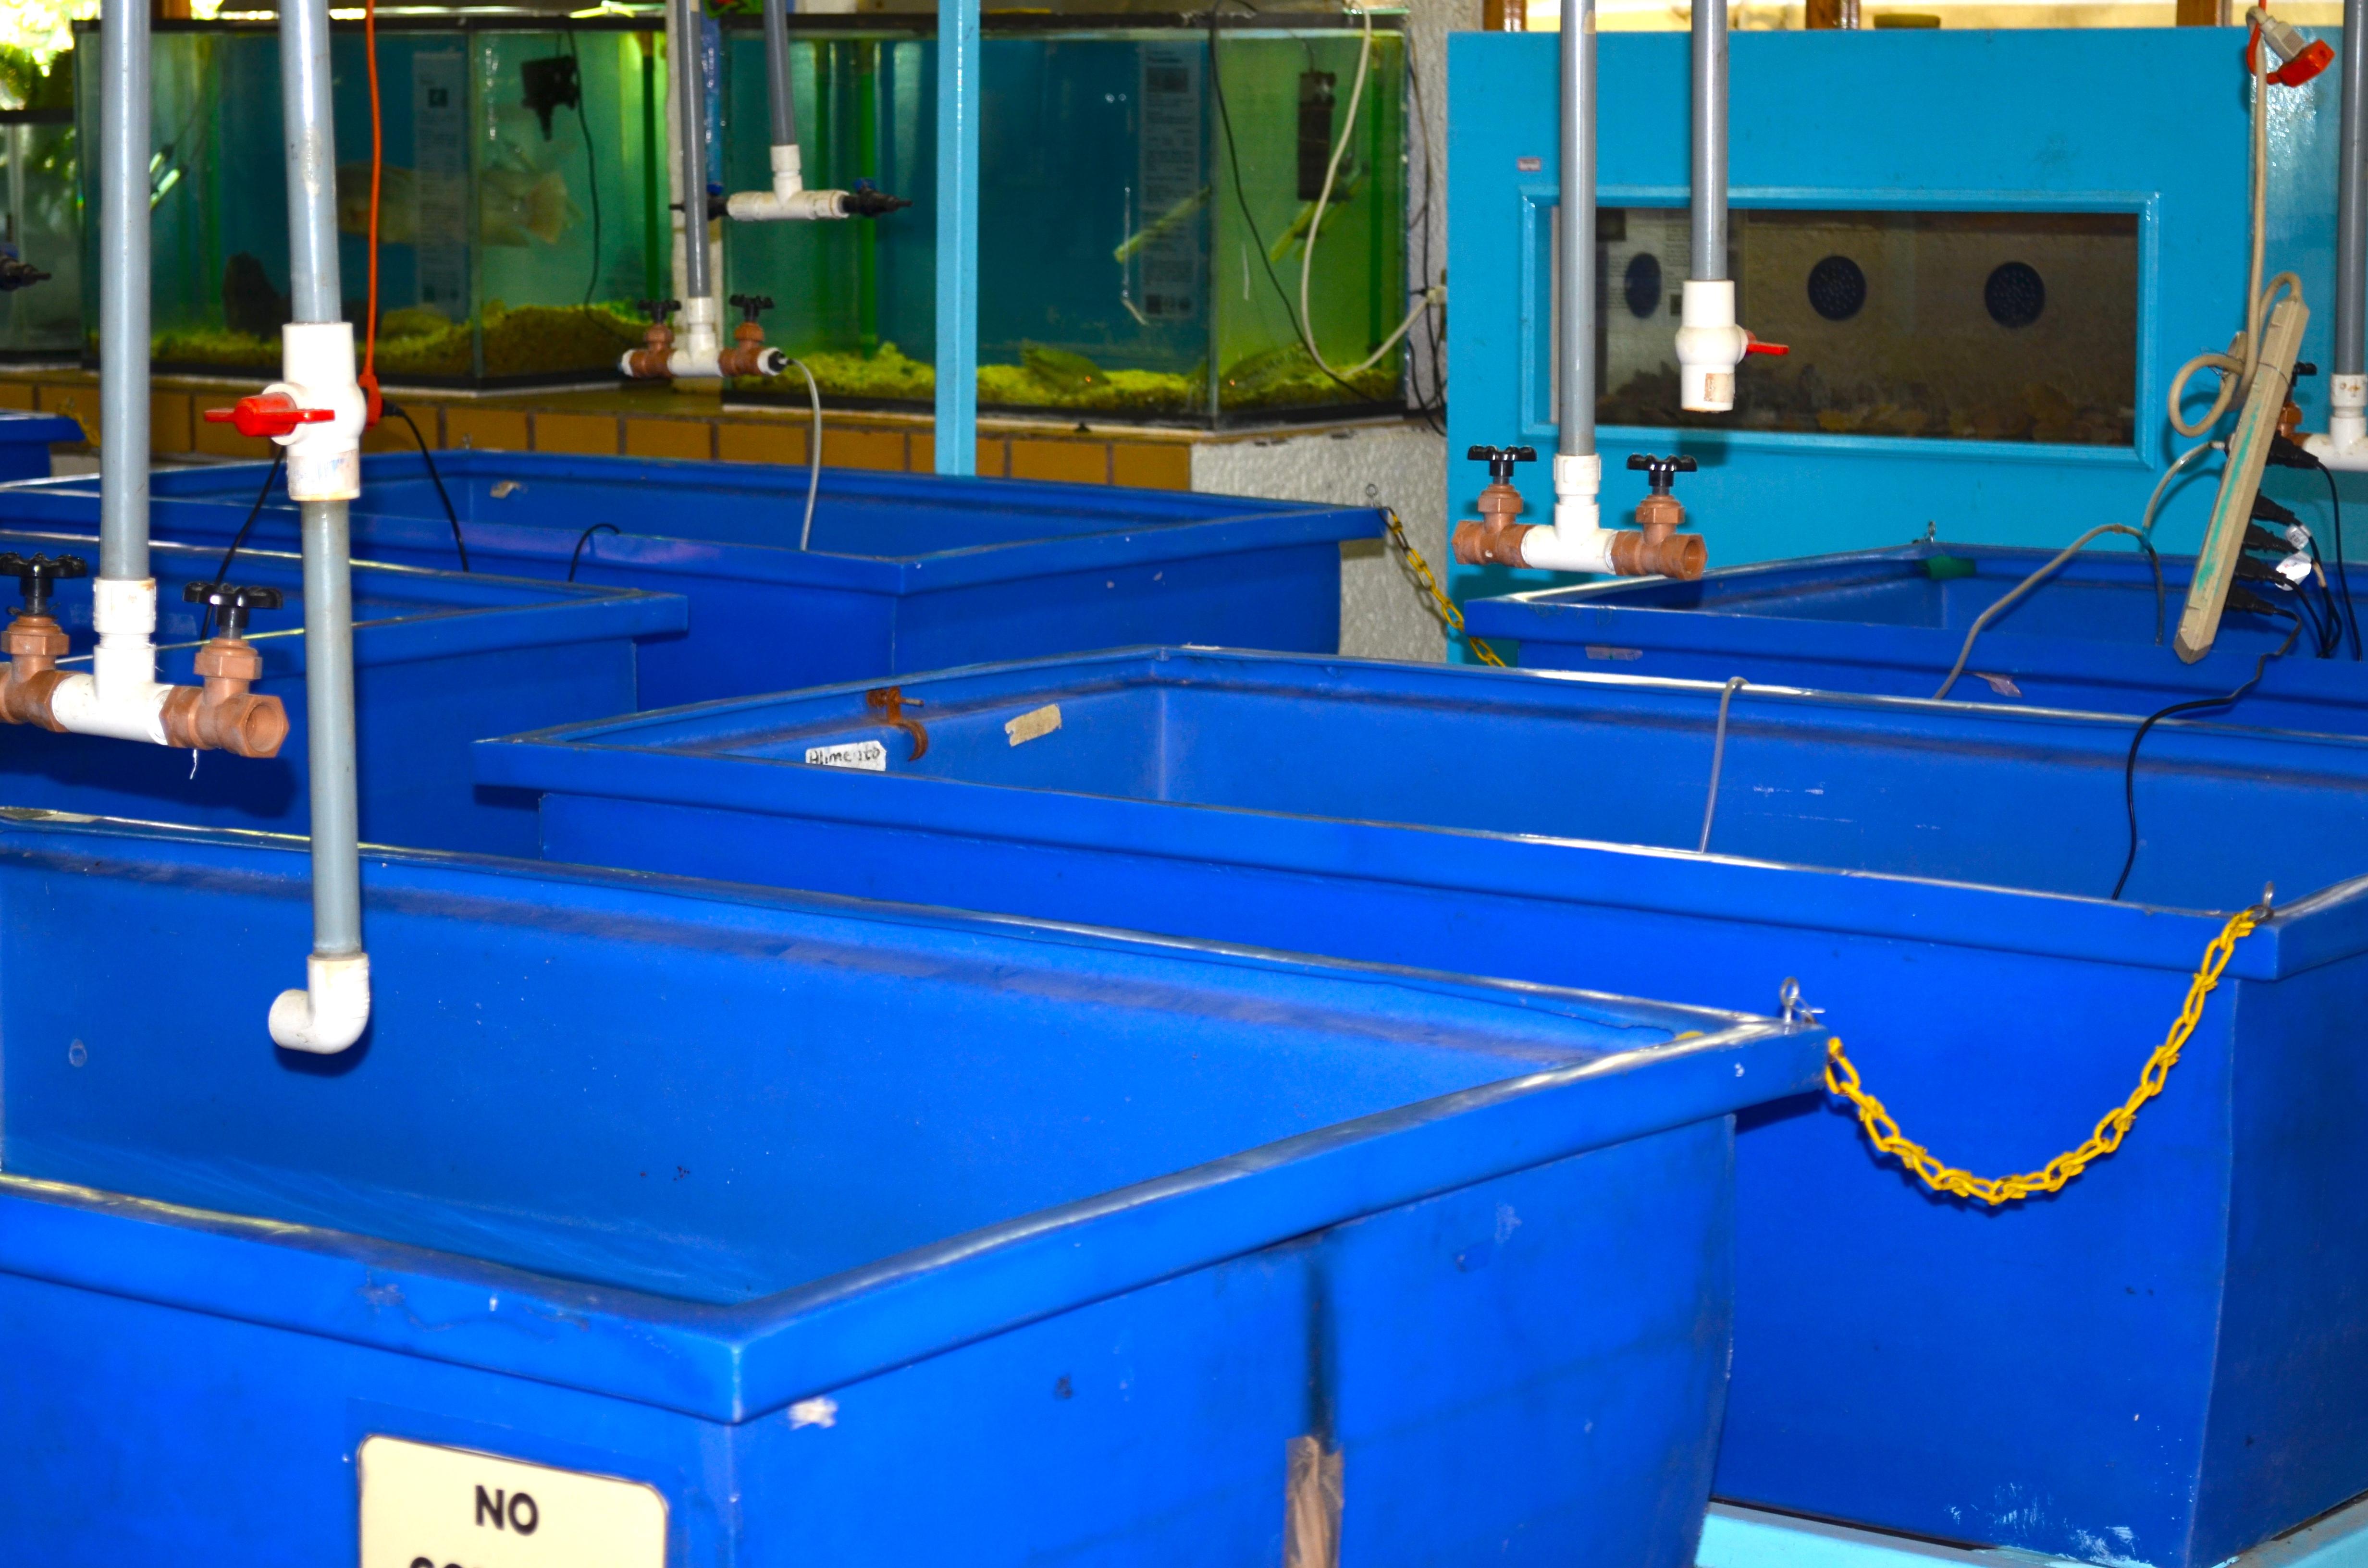 File:Plastic fish tubs.JPG - Wikimedia Commons